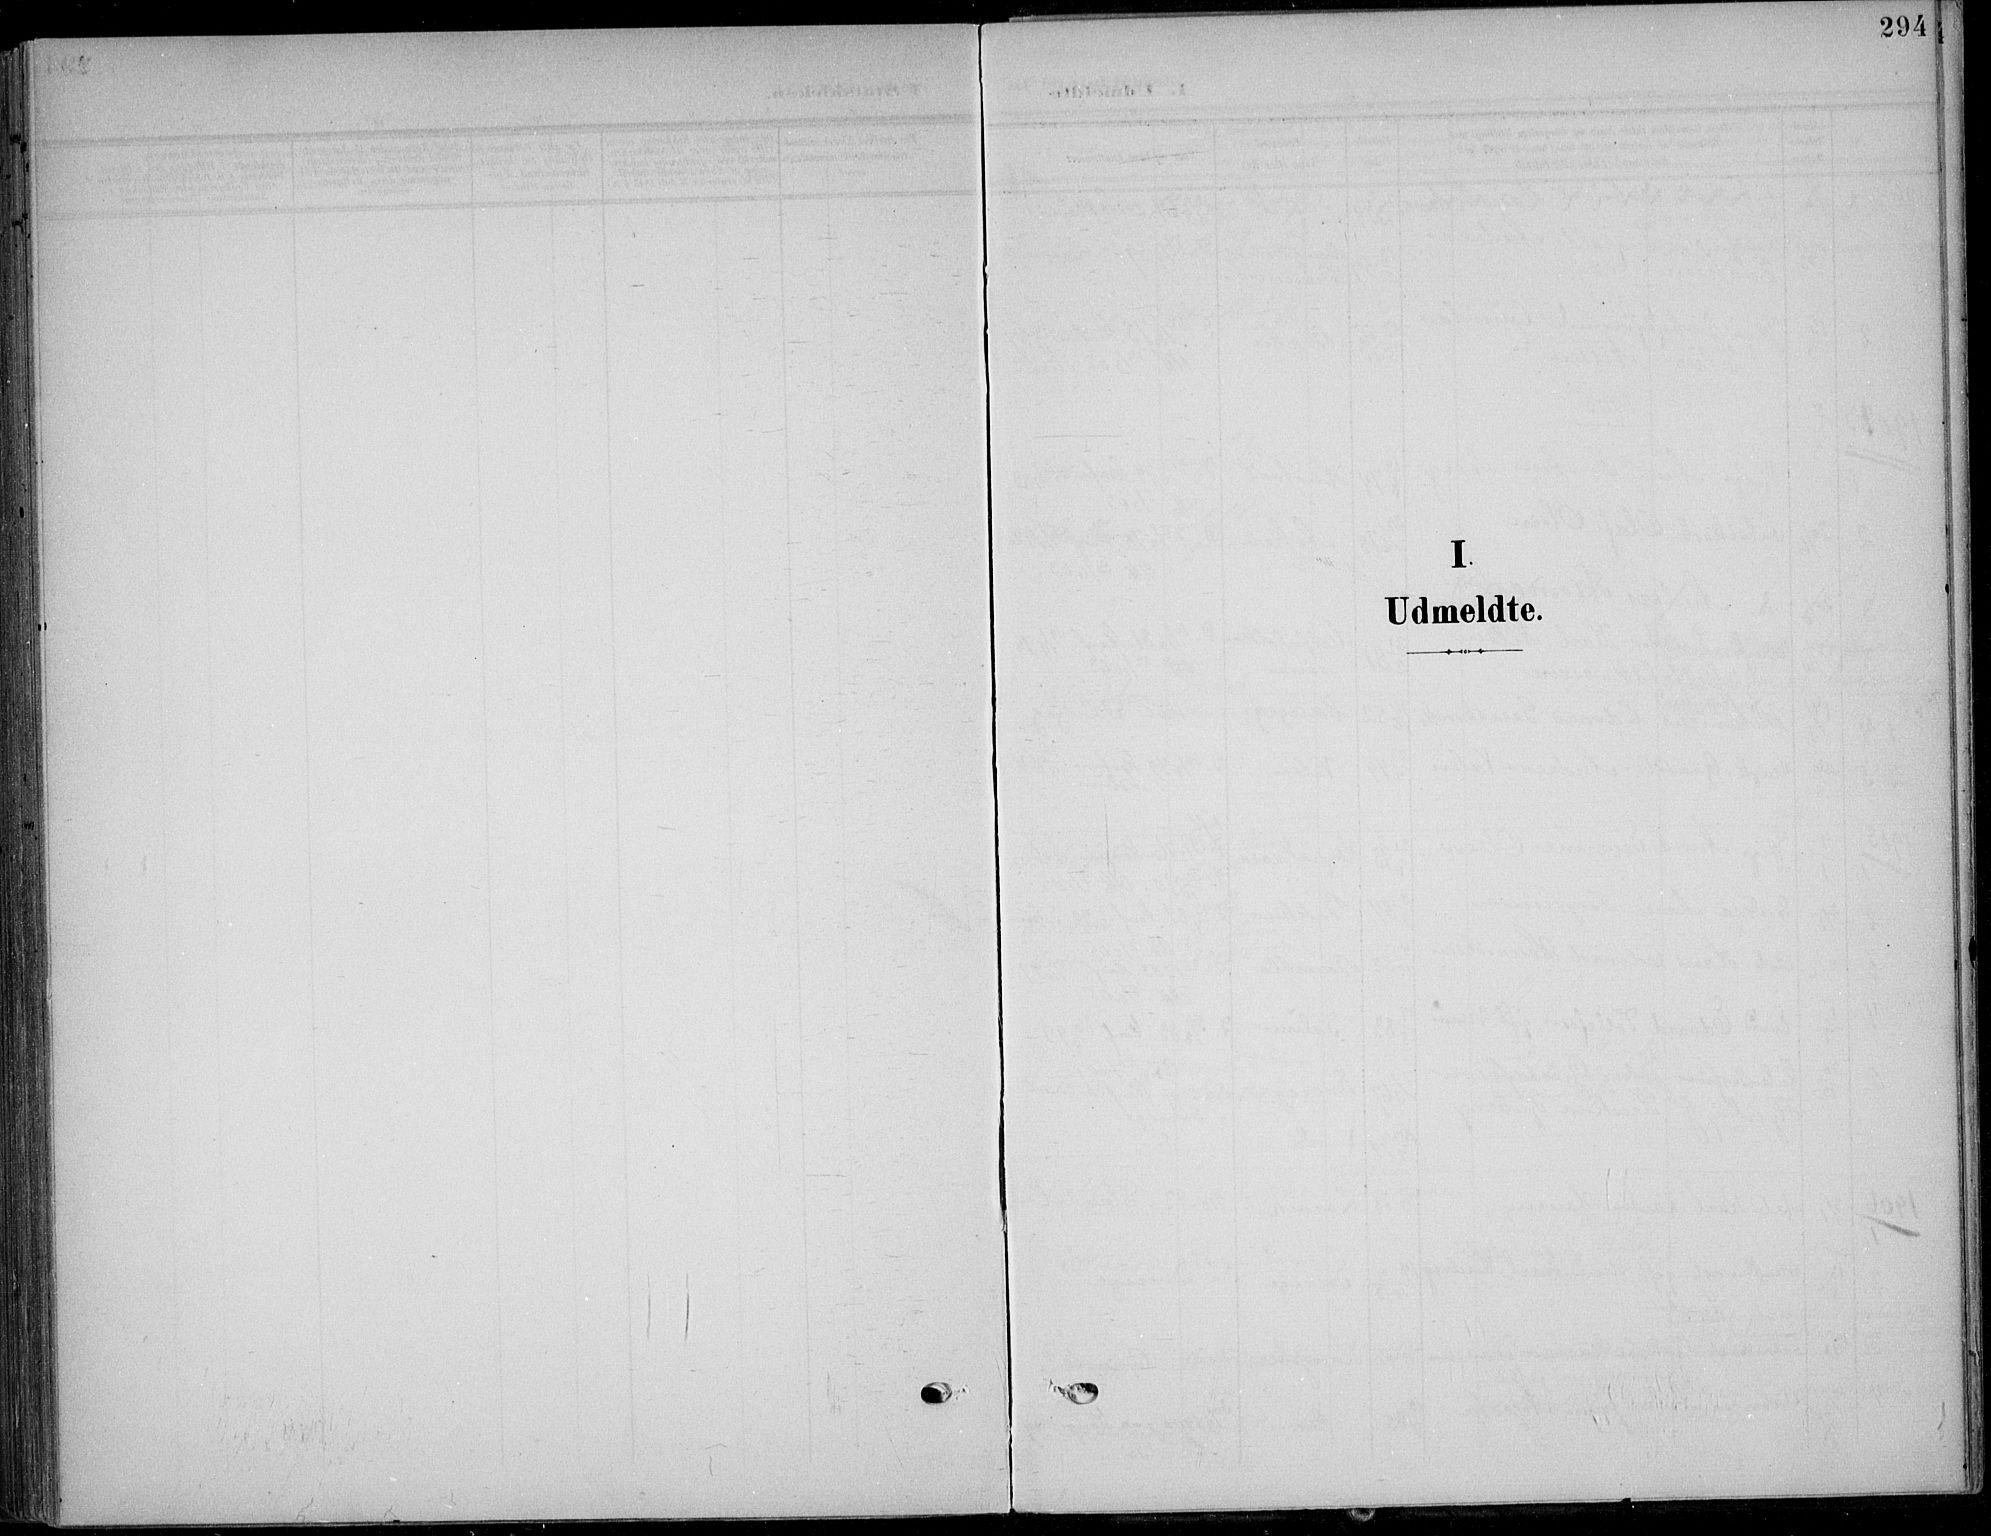 SAKO, Solum kirkebøker, F/Fb/L0003: Ministerialbok nr. II 3, 1901-1912, s. 294